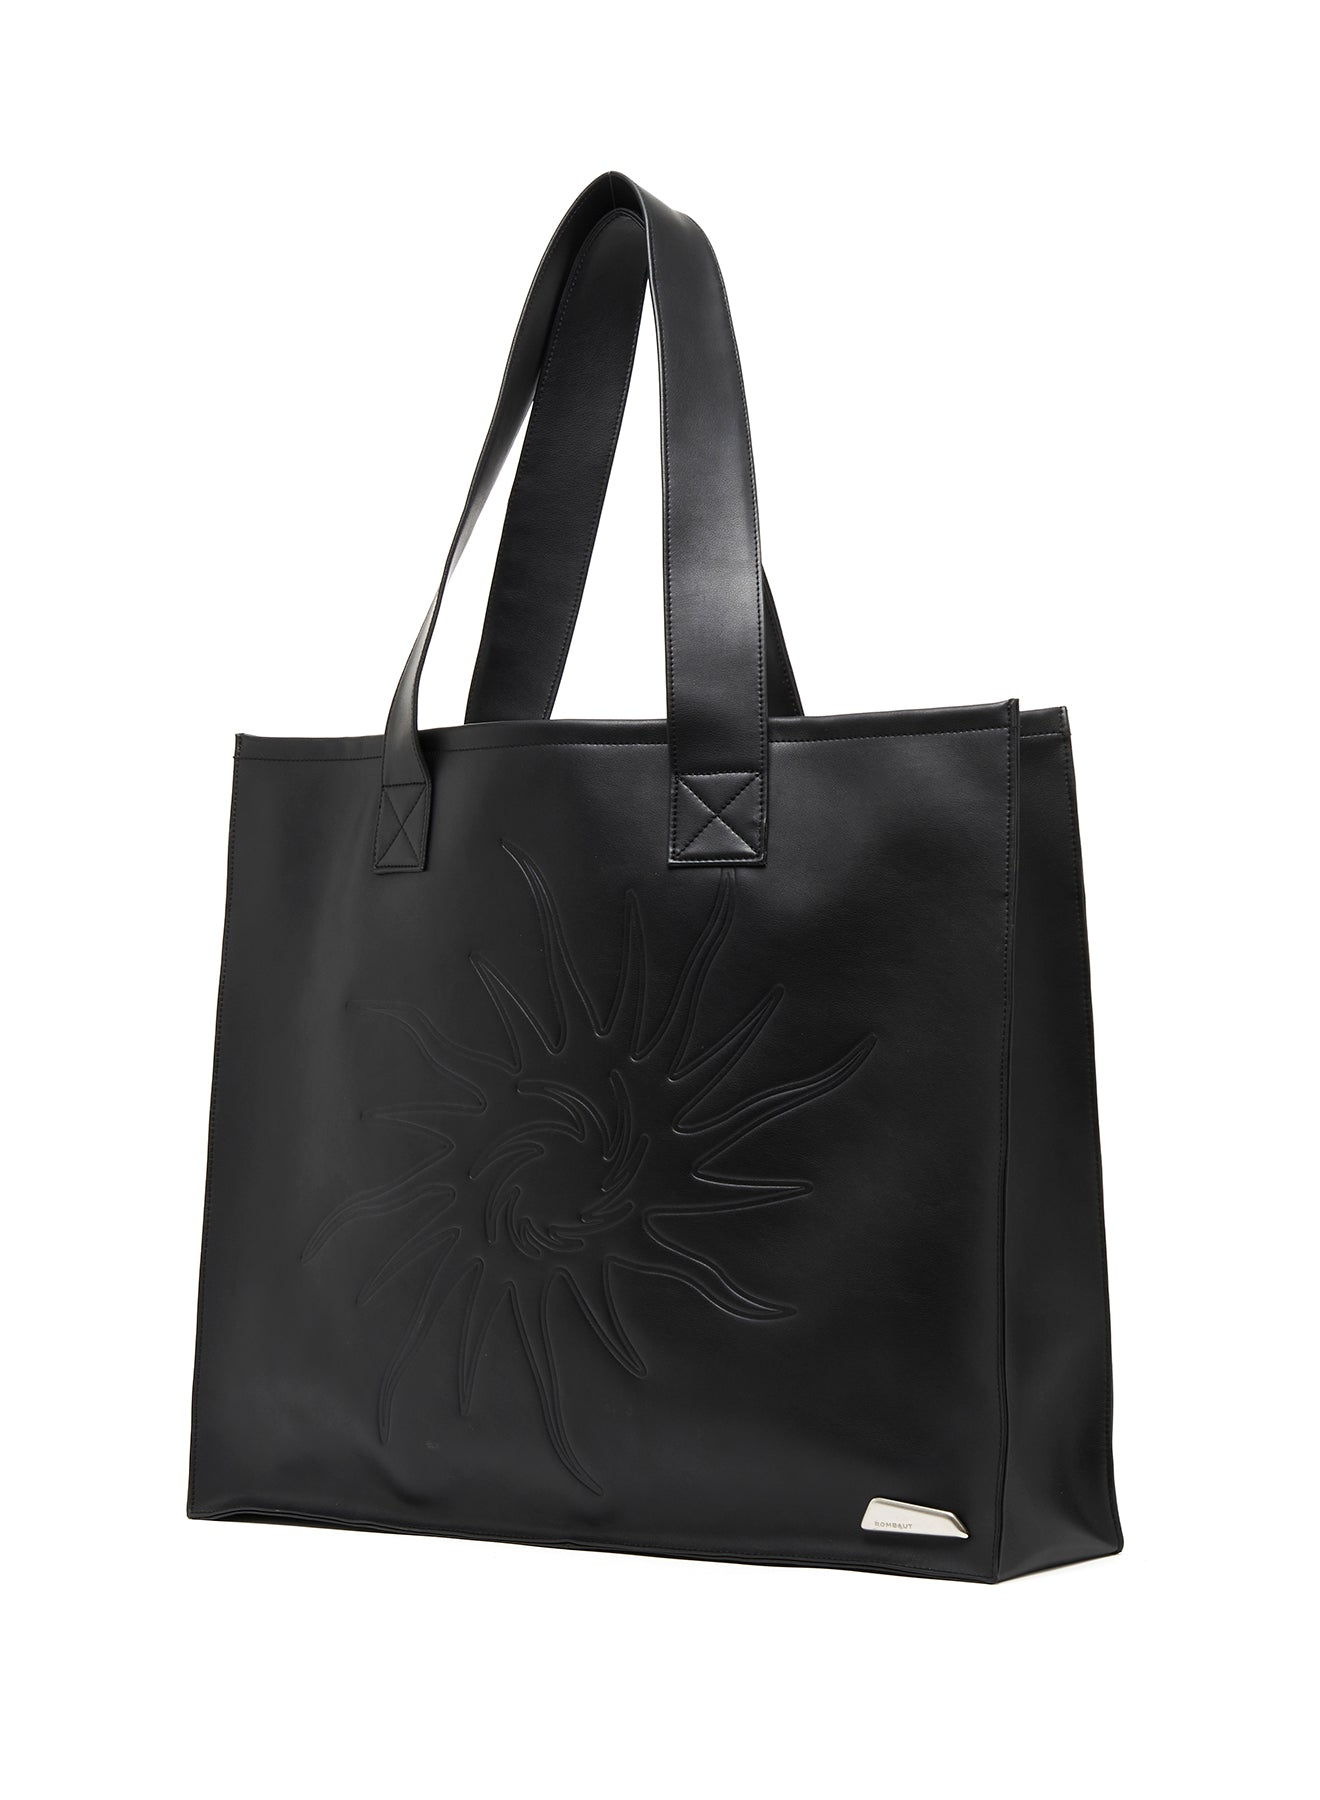 SHOPPING BAG FUTURE LEATHER BLACK